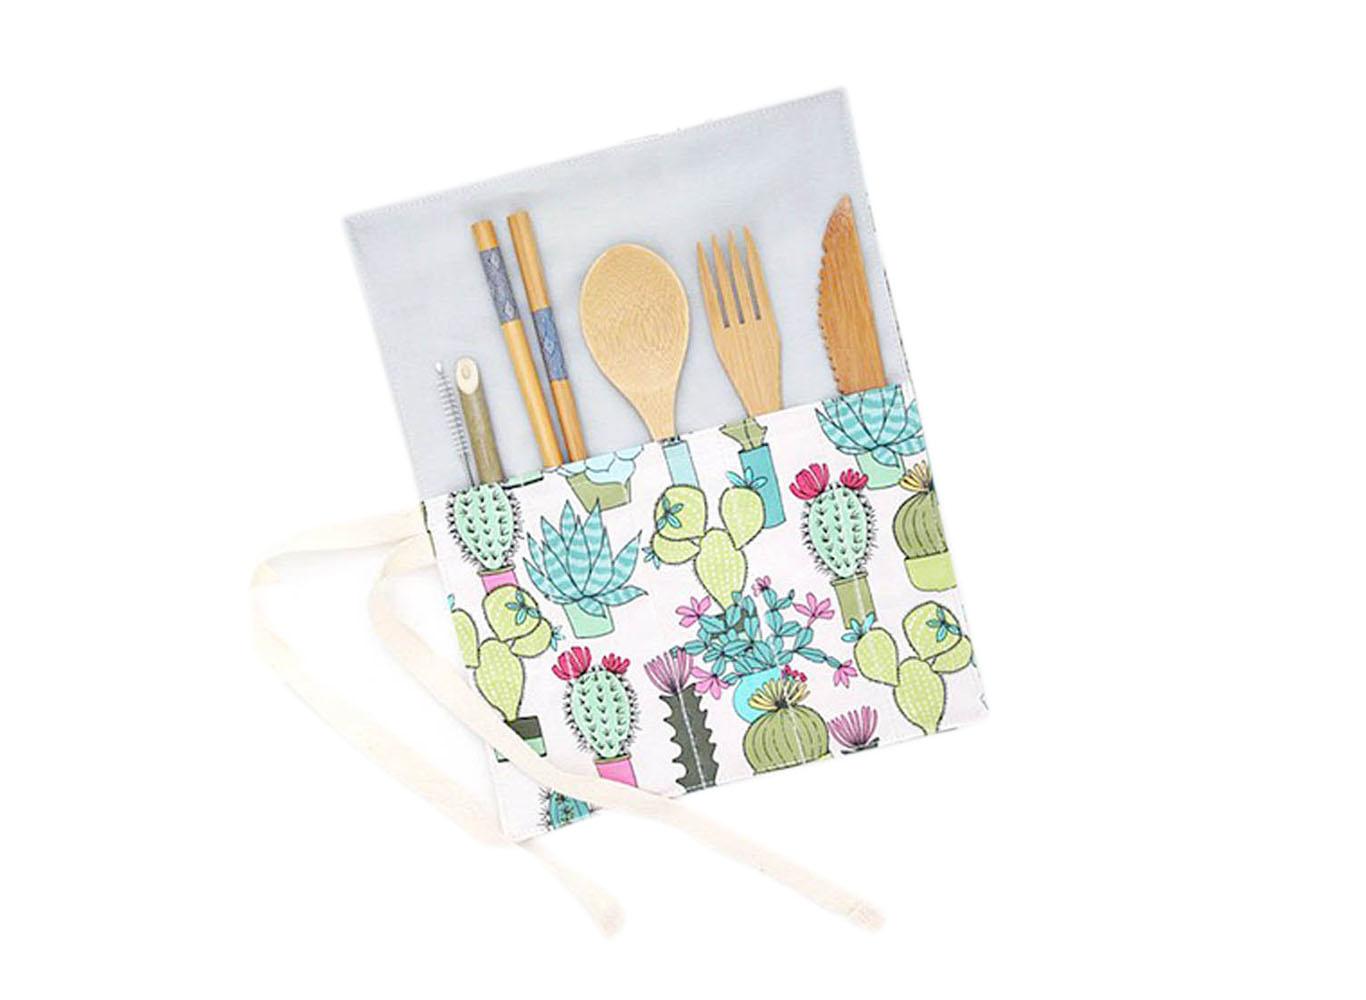 Bamboo Cutlery Set Custom Print Fold Up Pouch